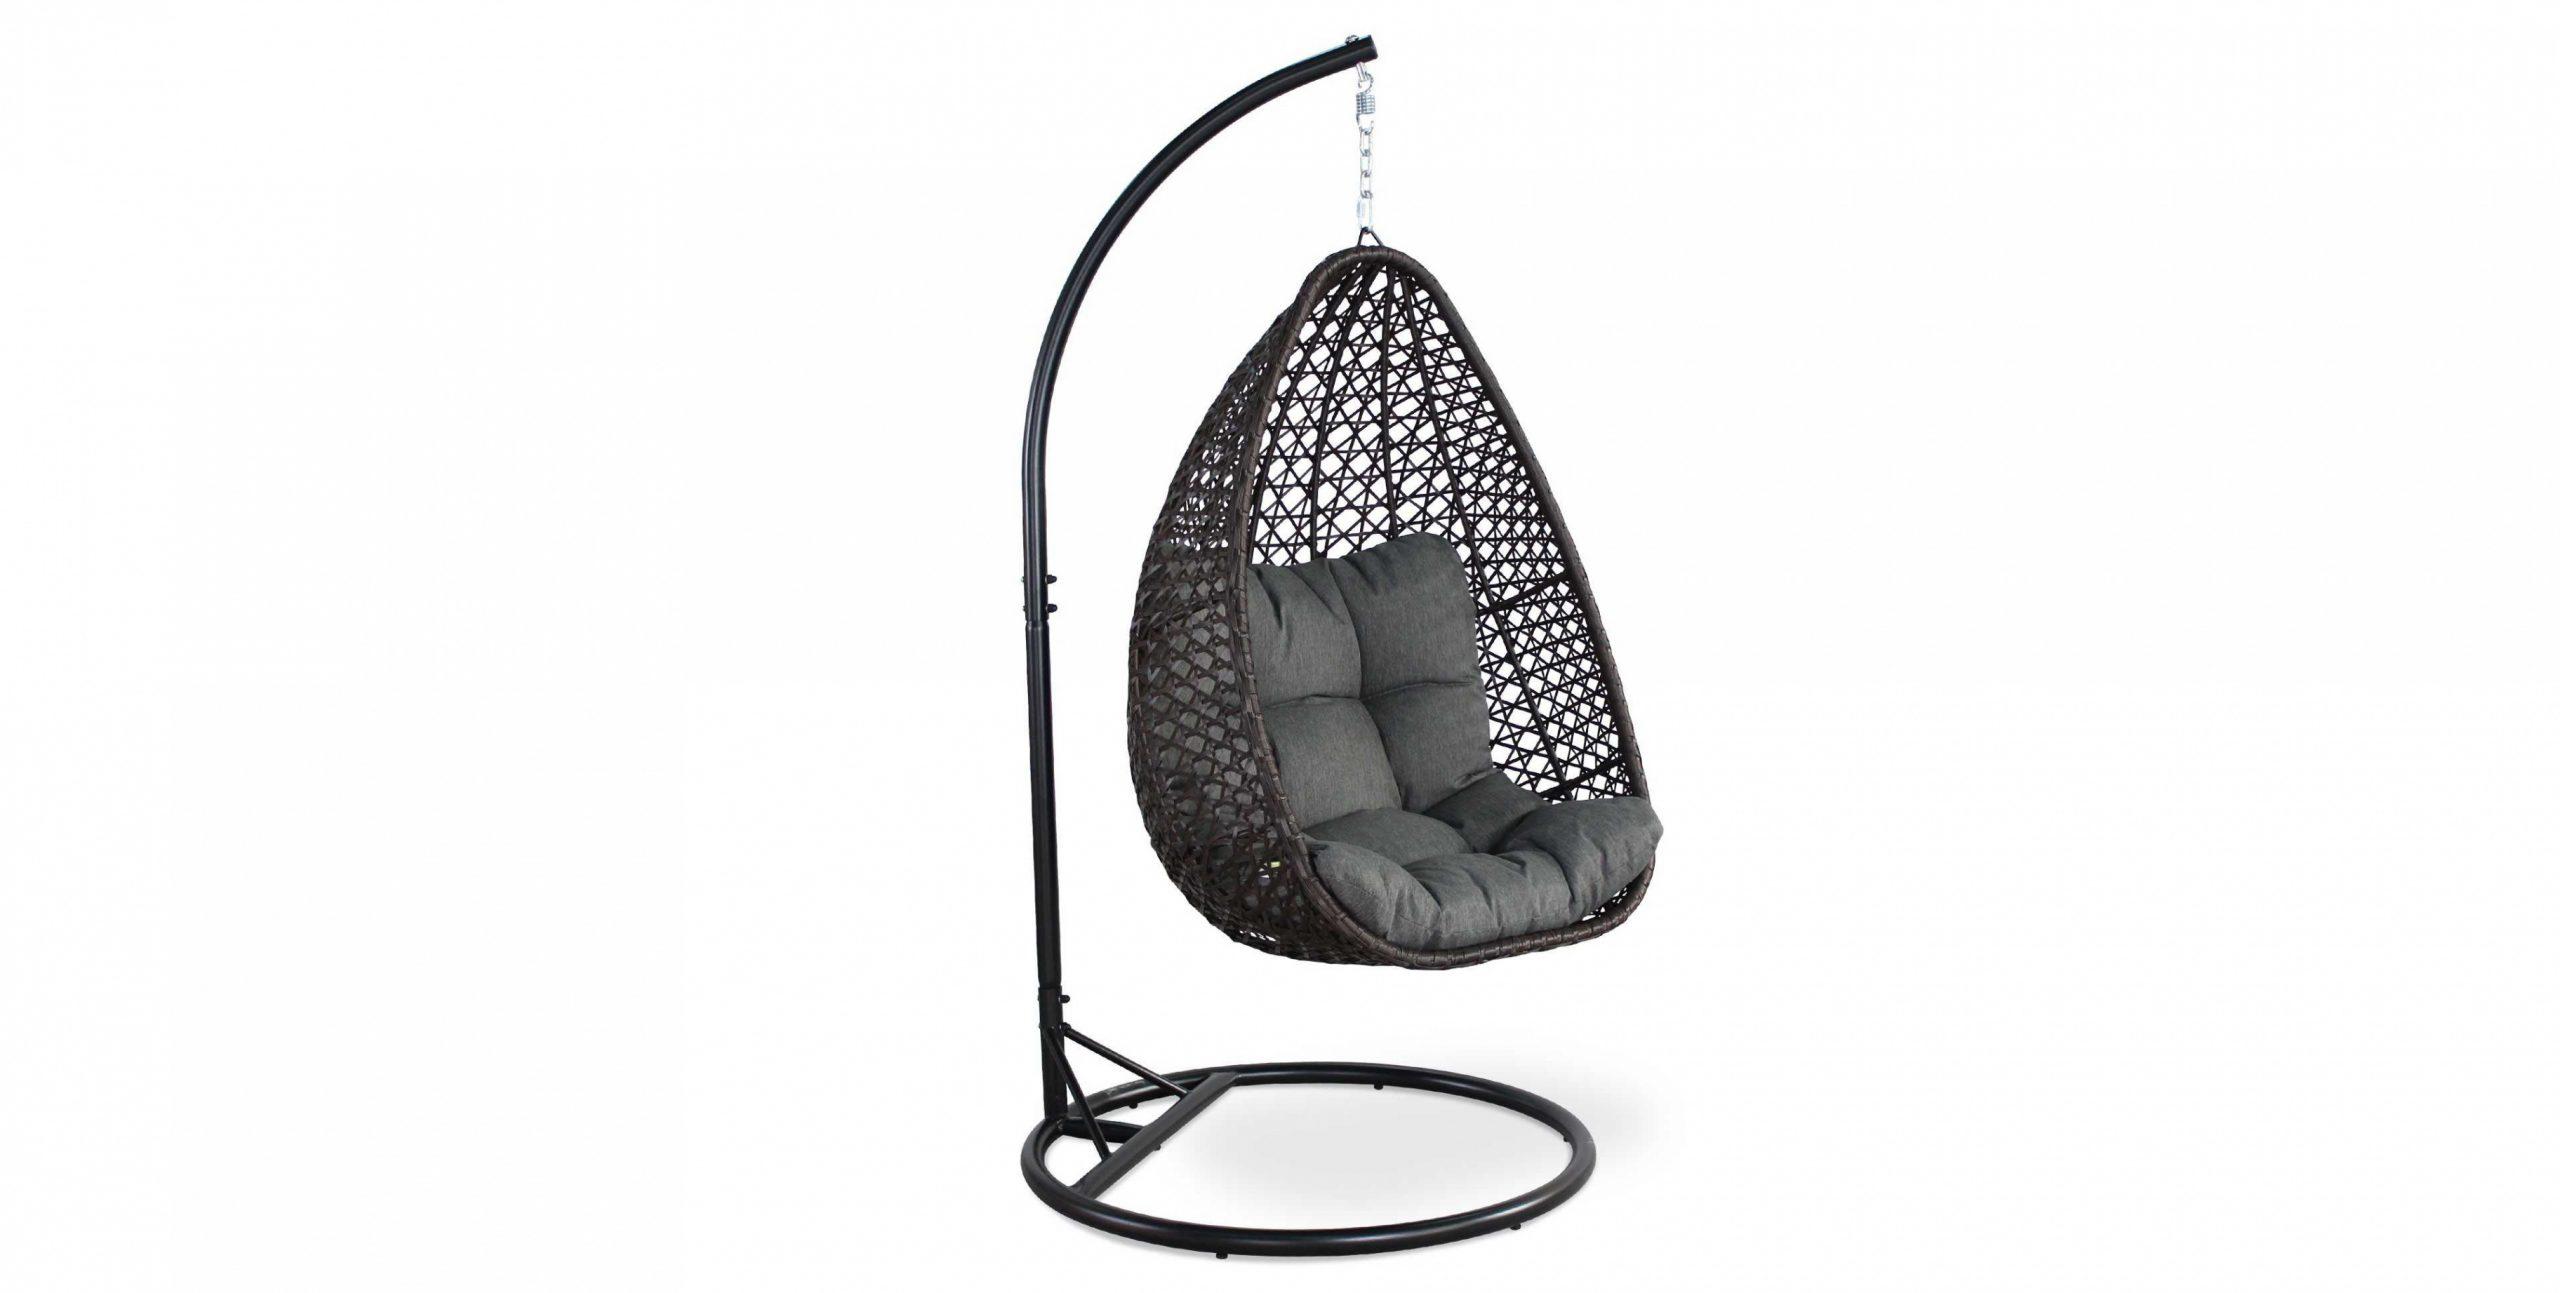 Fauteuil Balancelle Ikea – Gamboahinestrosa destiné Chaise Suspendue Ikea